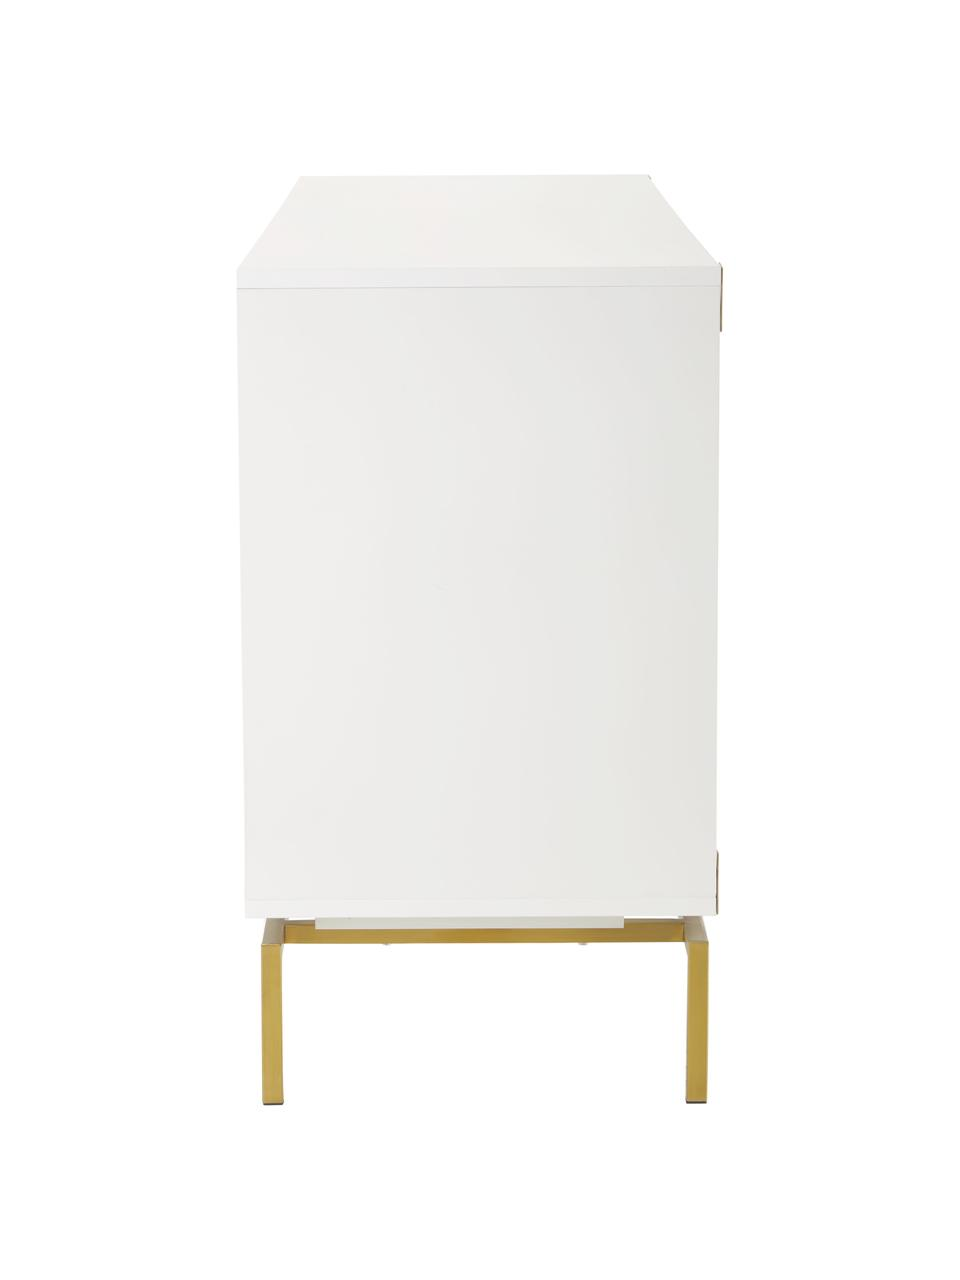 Credenza bianca Elegance, Bianco, Larg. 150 x Alt. 80 cm